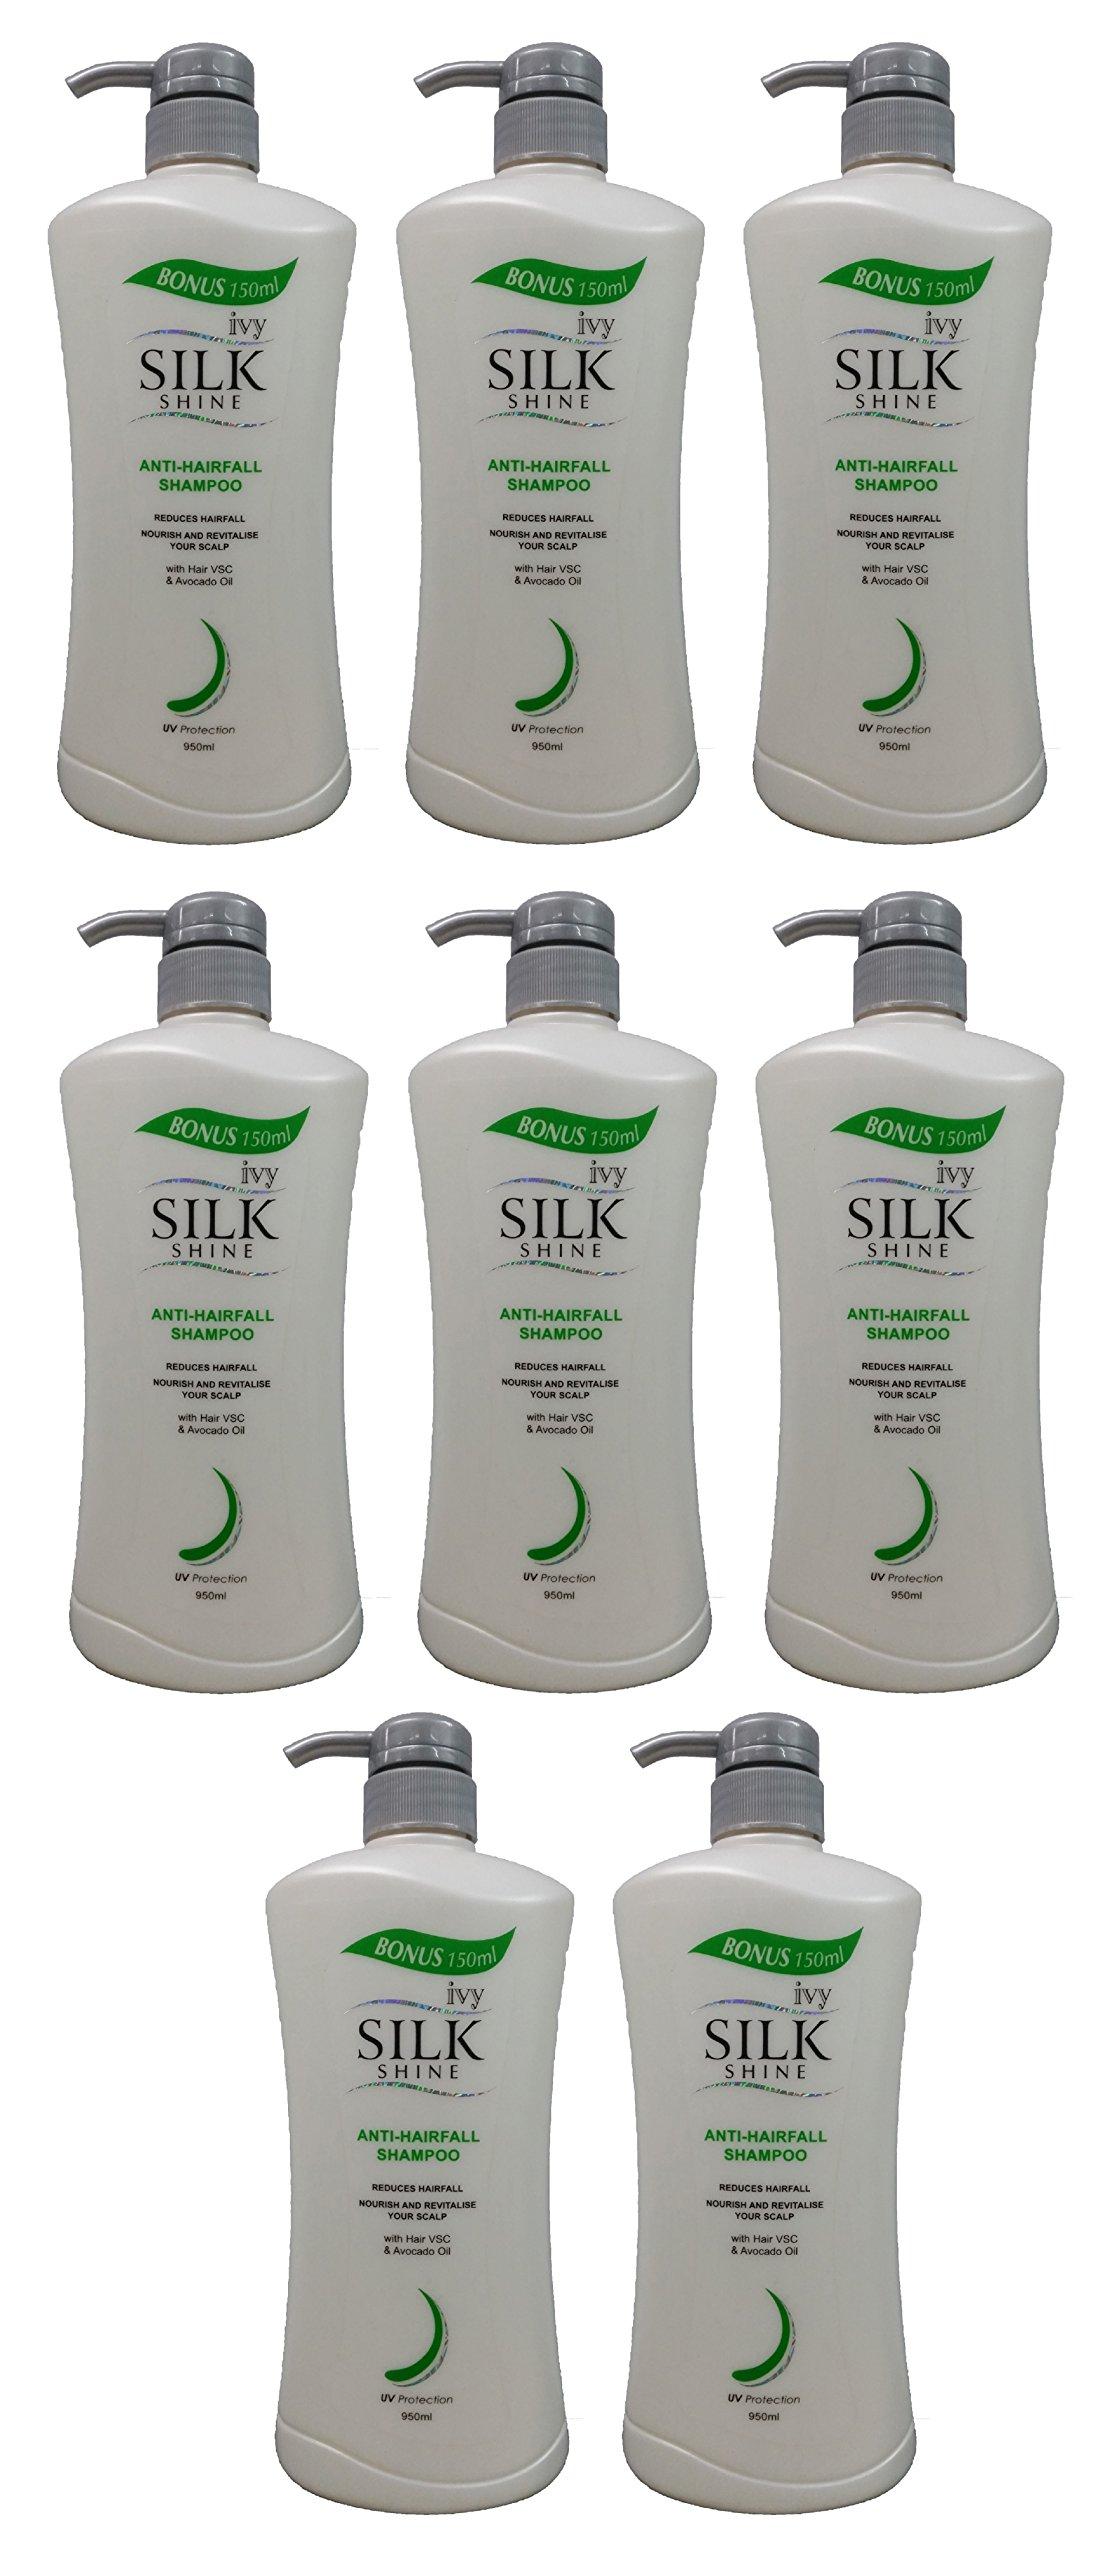 AWARD-WINNING 8 BOTTLES Ivy Silkshine ANTI-HAIRFALL & SCALP CARE Daily Hair Shampoo (950ml / 32 fl oz) by Leivy – Reduce Hairfall, Promote Healthy Scalp, Repair Damage, Moisturizing –GET IN 1 WEEK